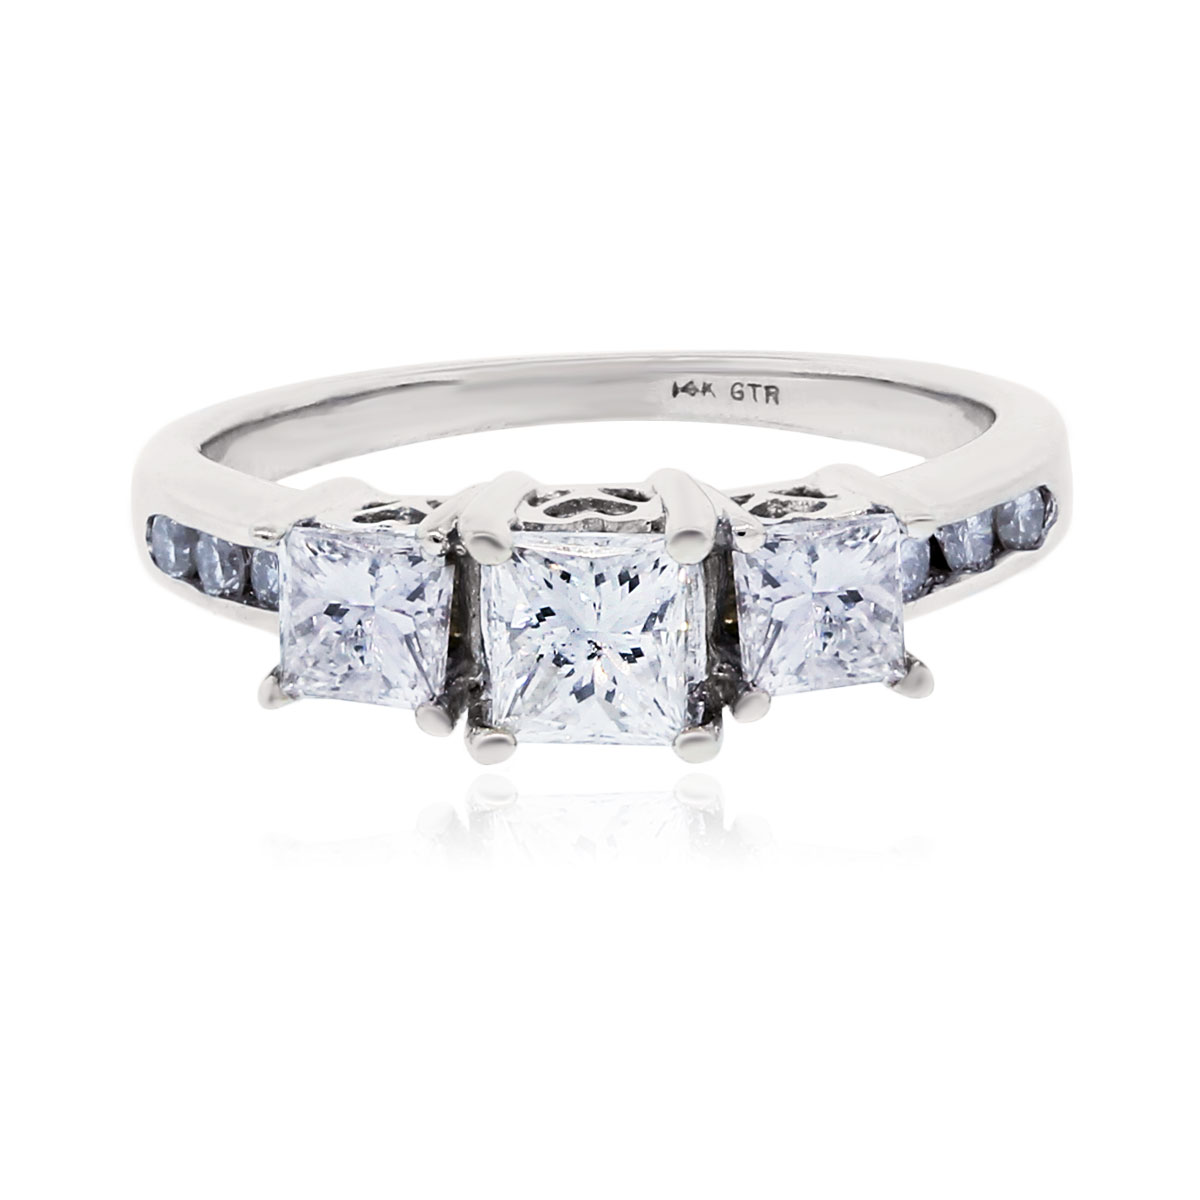 14k White Gold 1.10ctw Princess Cut Diamond Engagement Ring